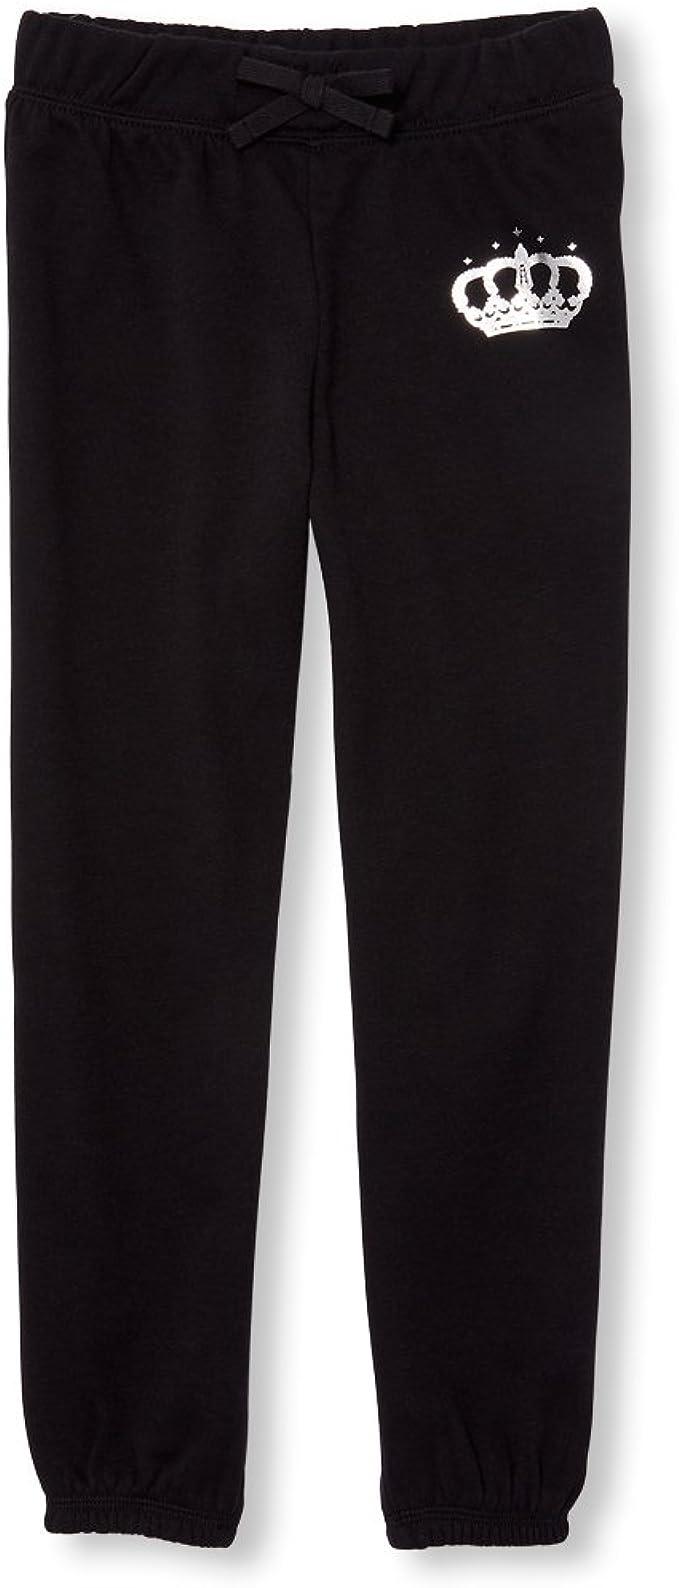 Amazon.com: The Children's Place Big Girls' Active Fleece Pants: Clothing